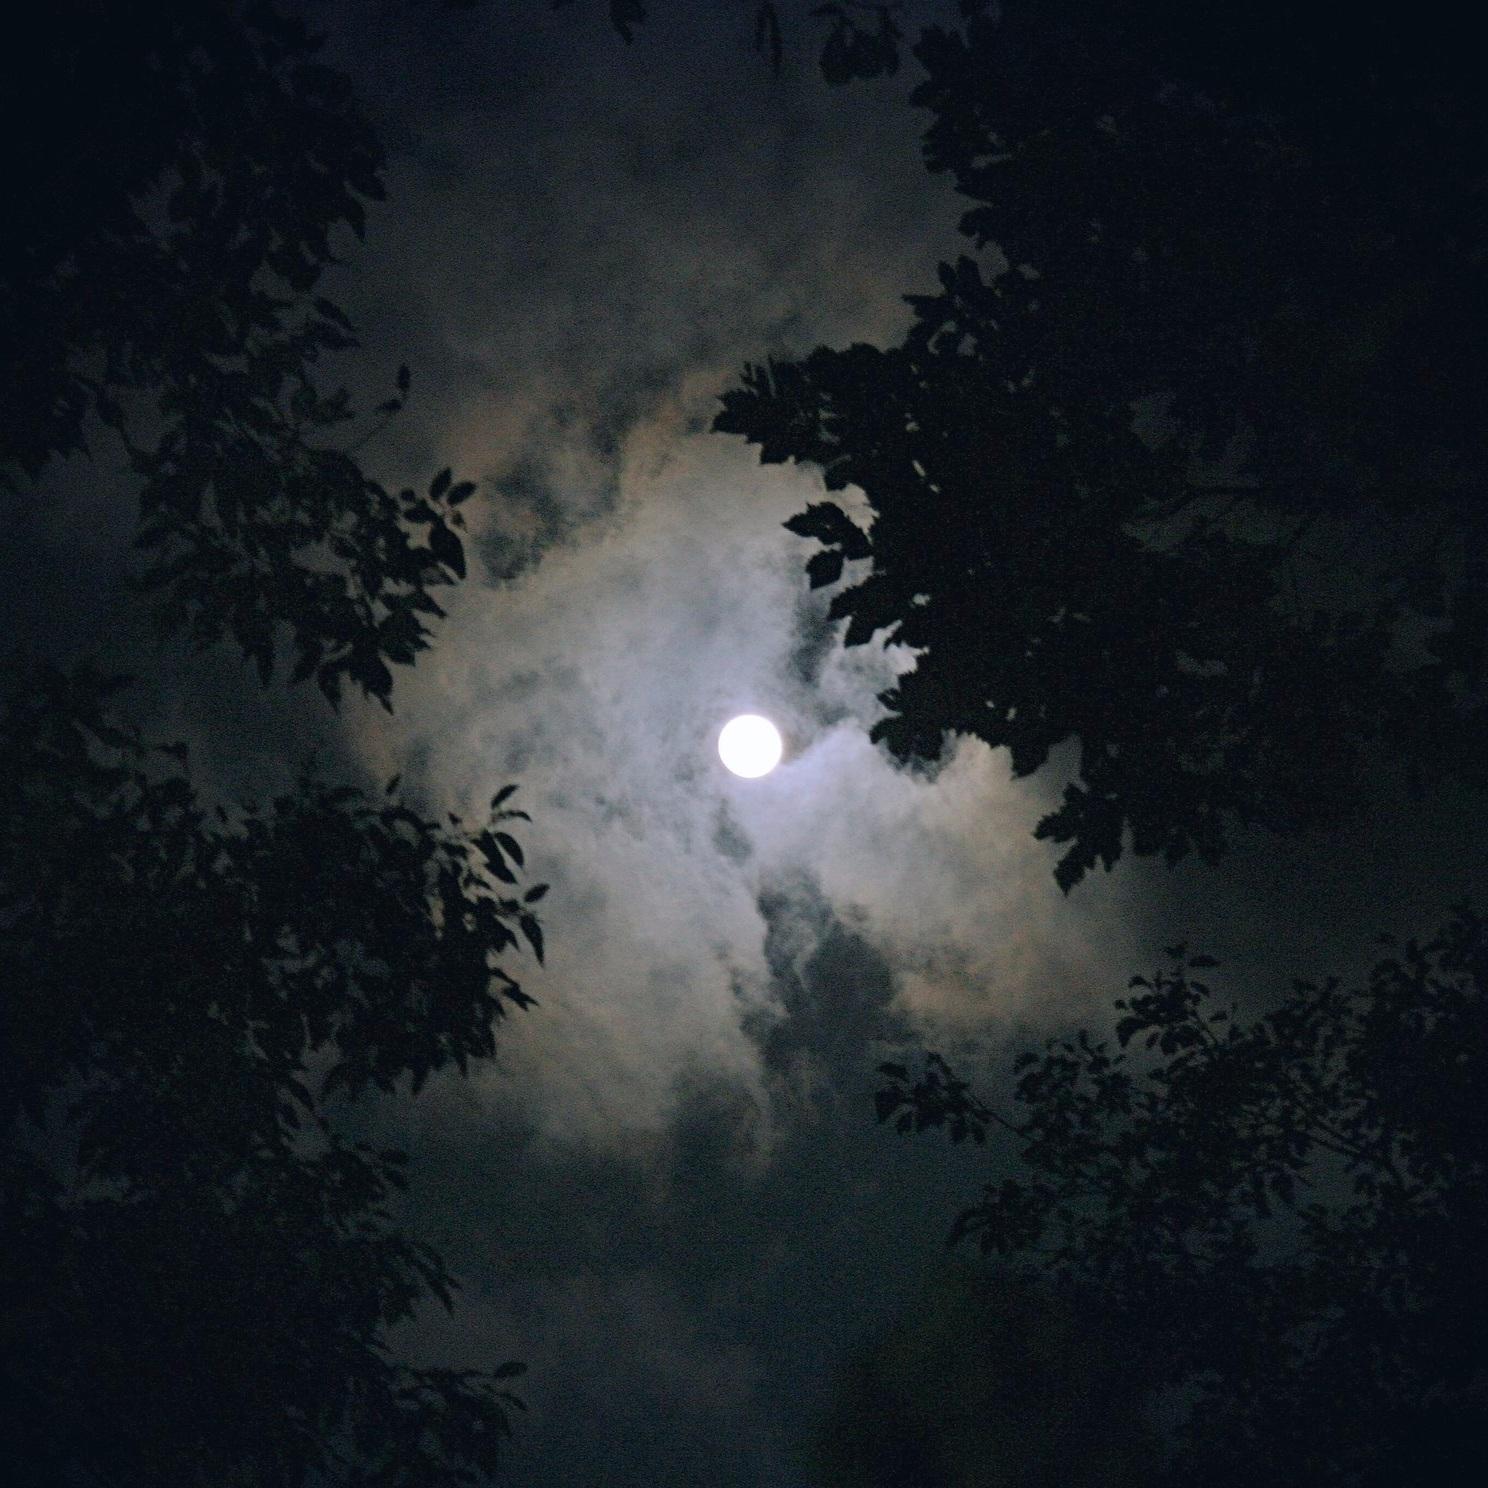 FullMoon_Darkness.jpg